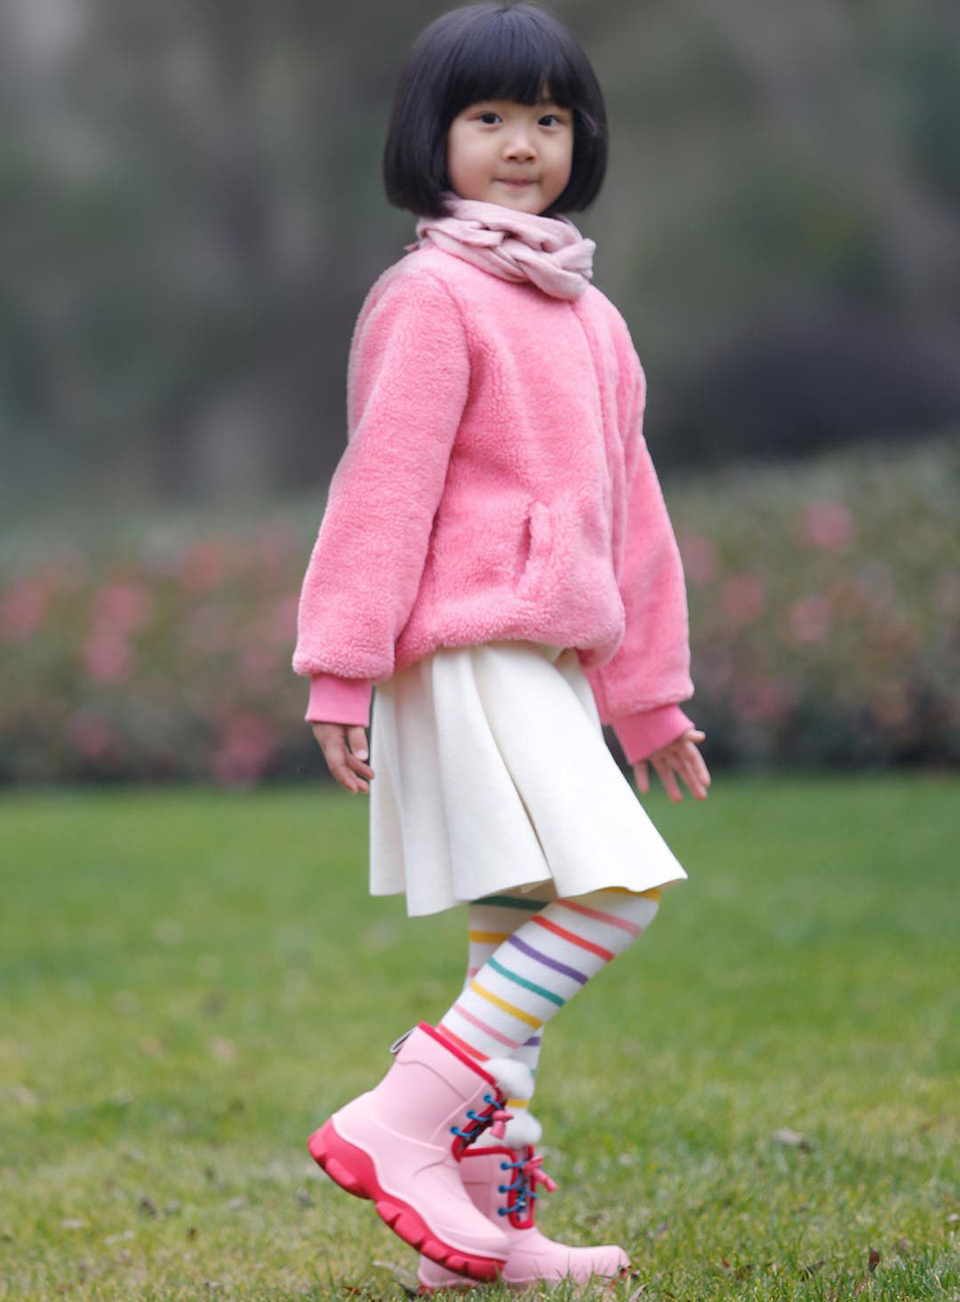 e6ec8c5e452c15 Дитячі чоботи Honeywell kids boots Green / Red 32 size на дівчинці